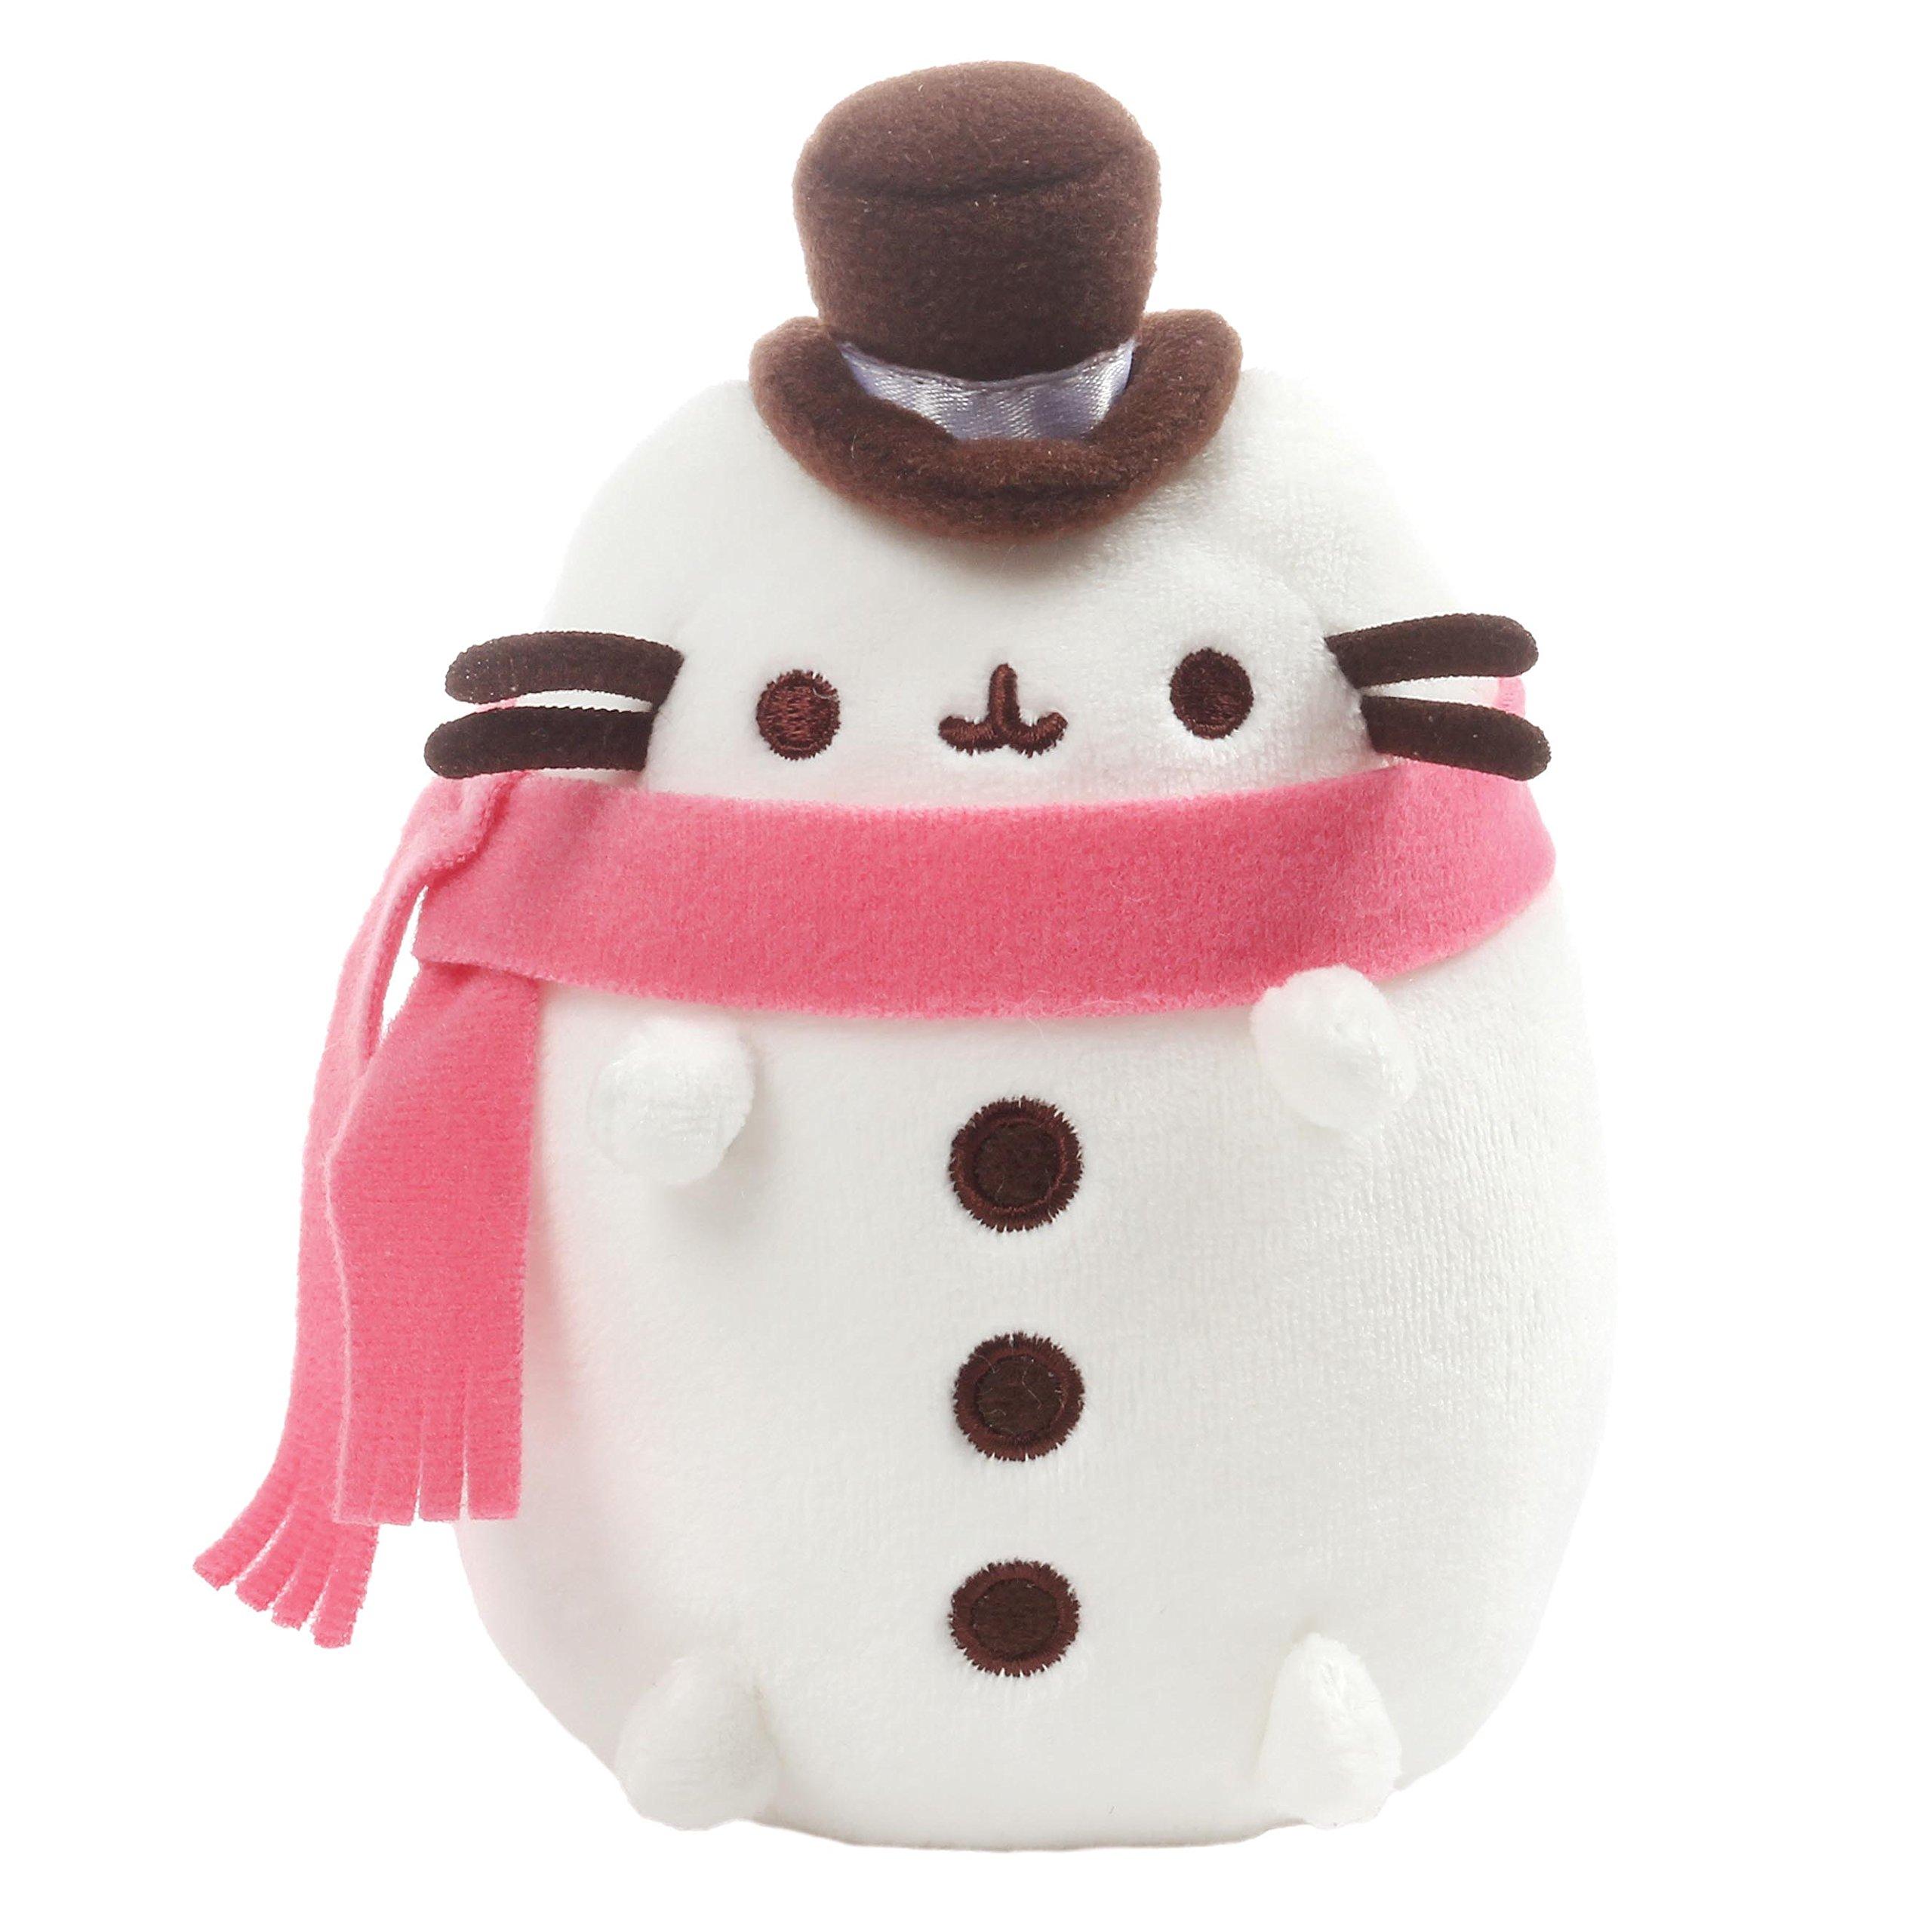 "GUND Pusheen Christmas Snowman Plush 6"" Stuffed Animal, White"